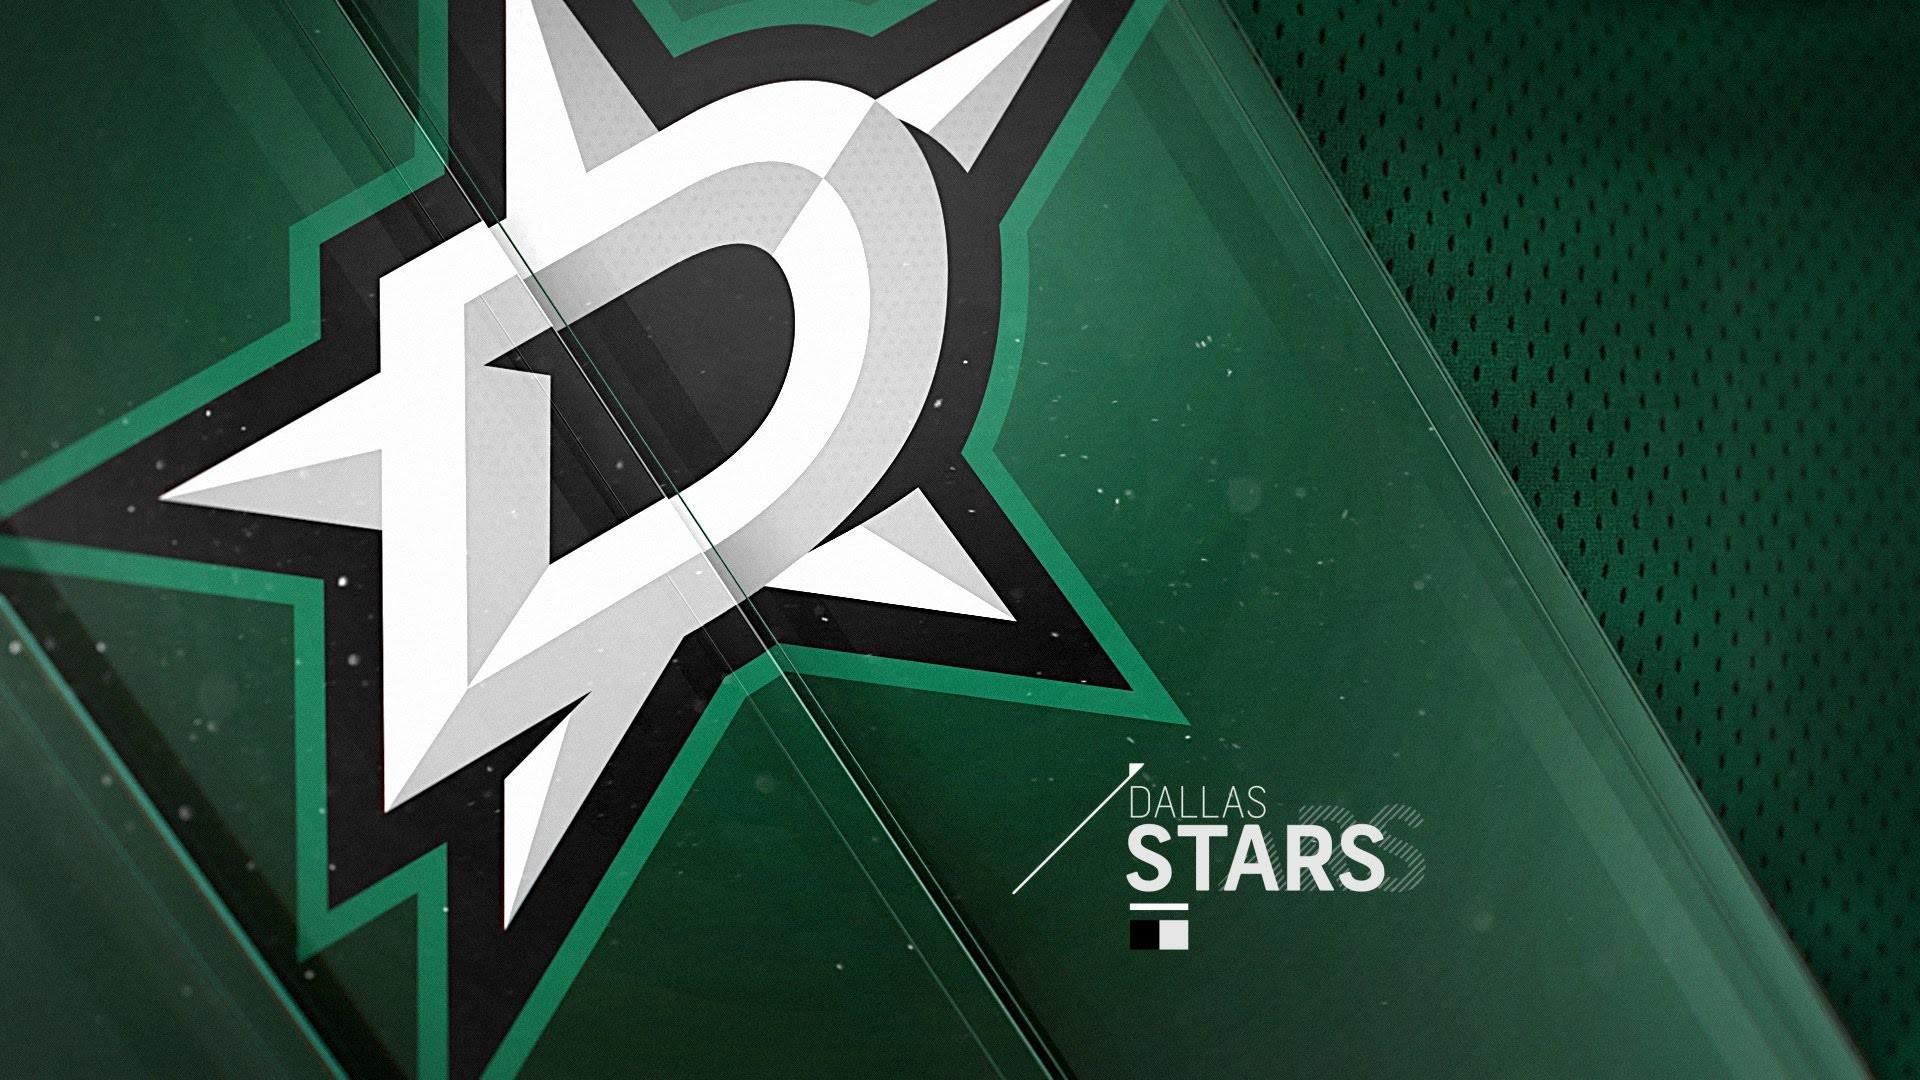 Dallas Stars goal song (tribute)